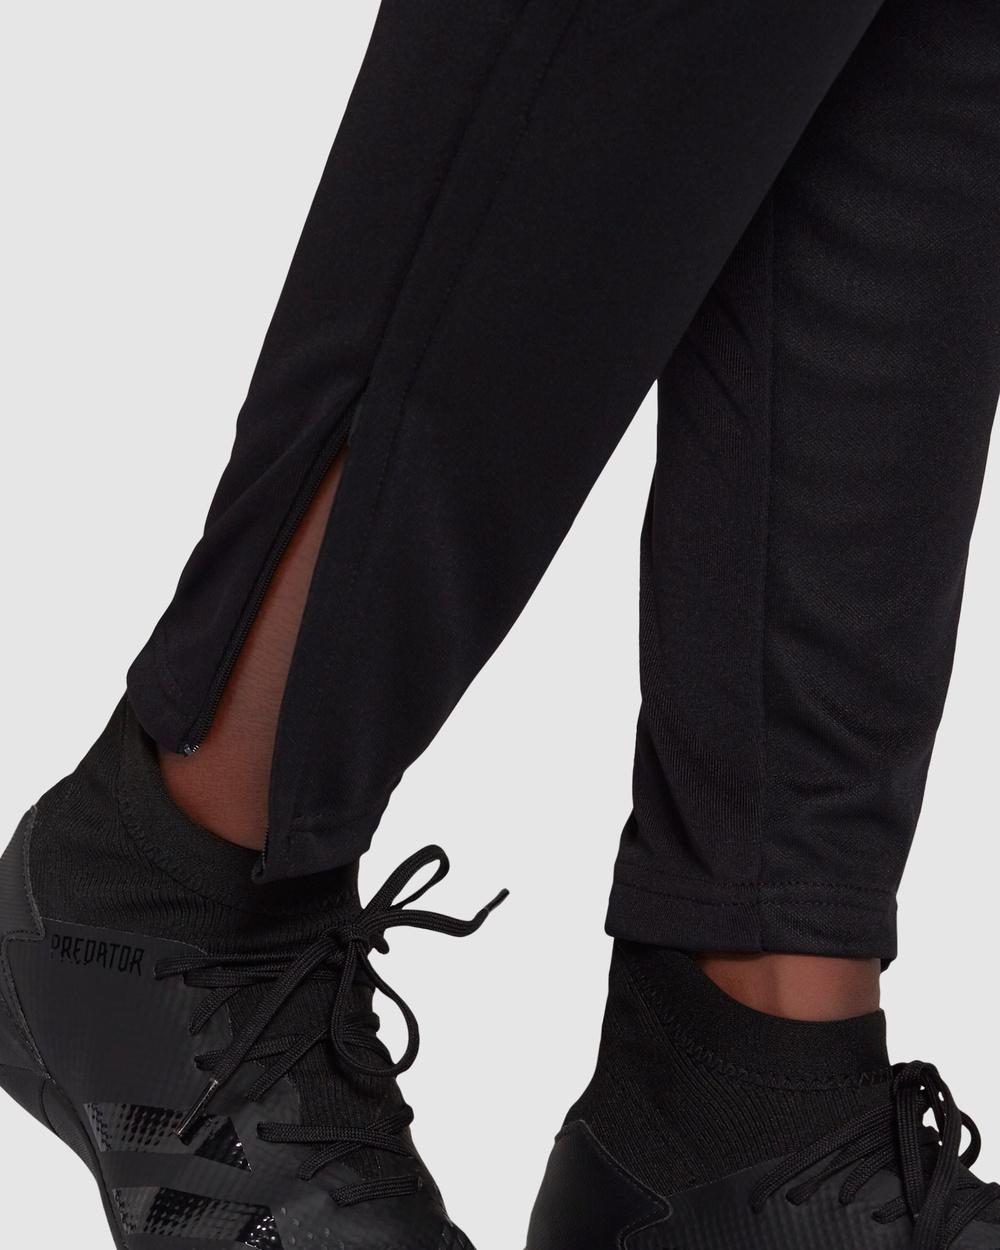 adidas Performance Tiro 21 Training Pants Black Australia